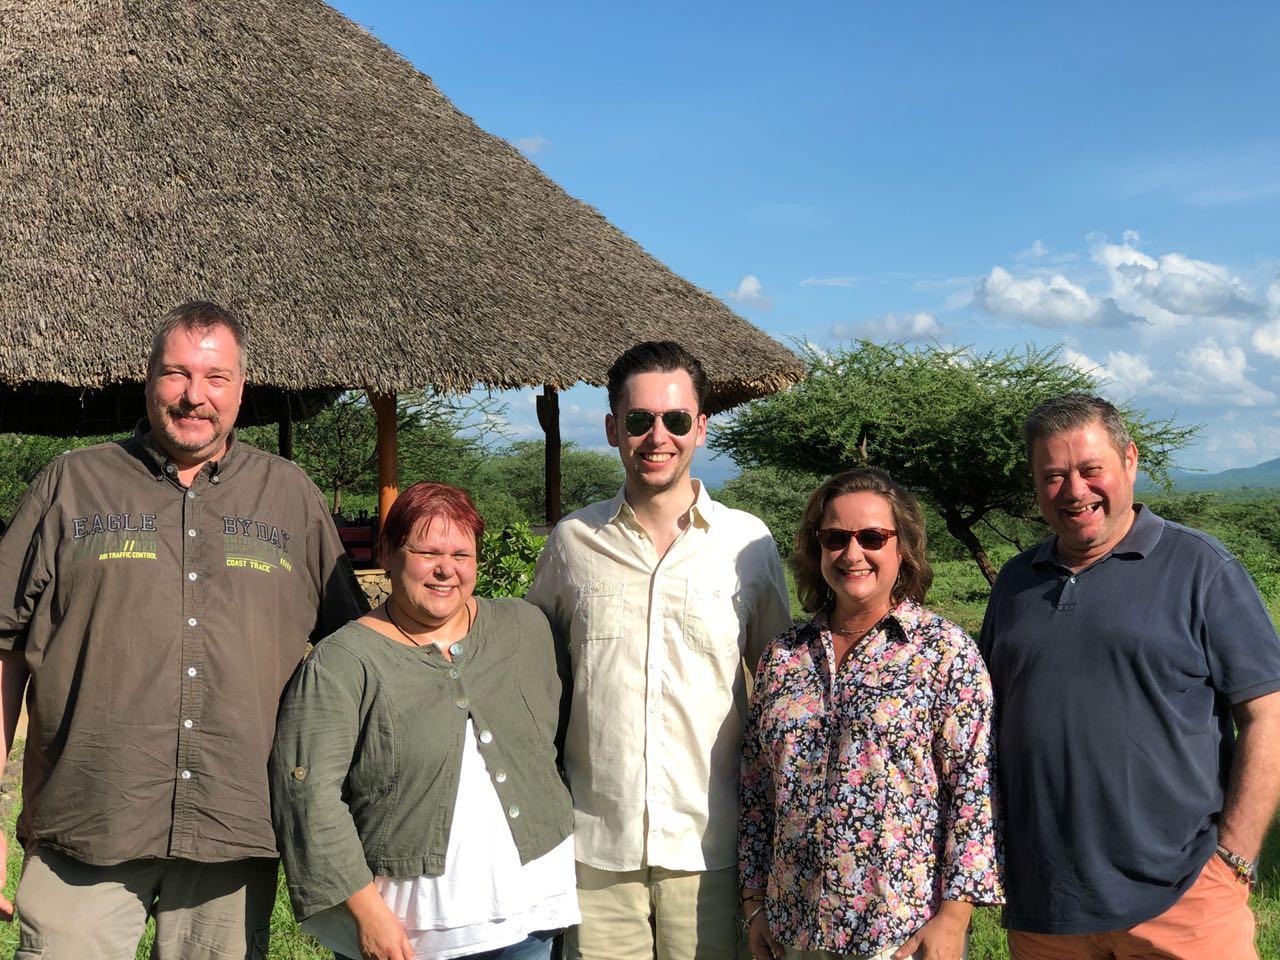 Managementwechsel am Mt. Kilimanjaro severin safari camp